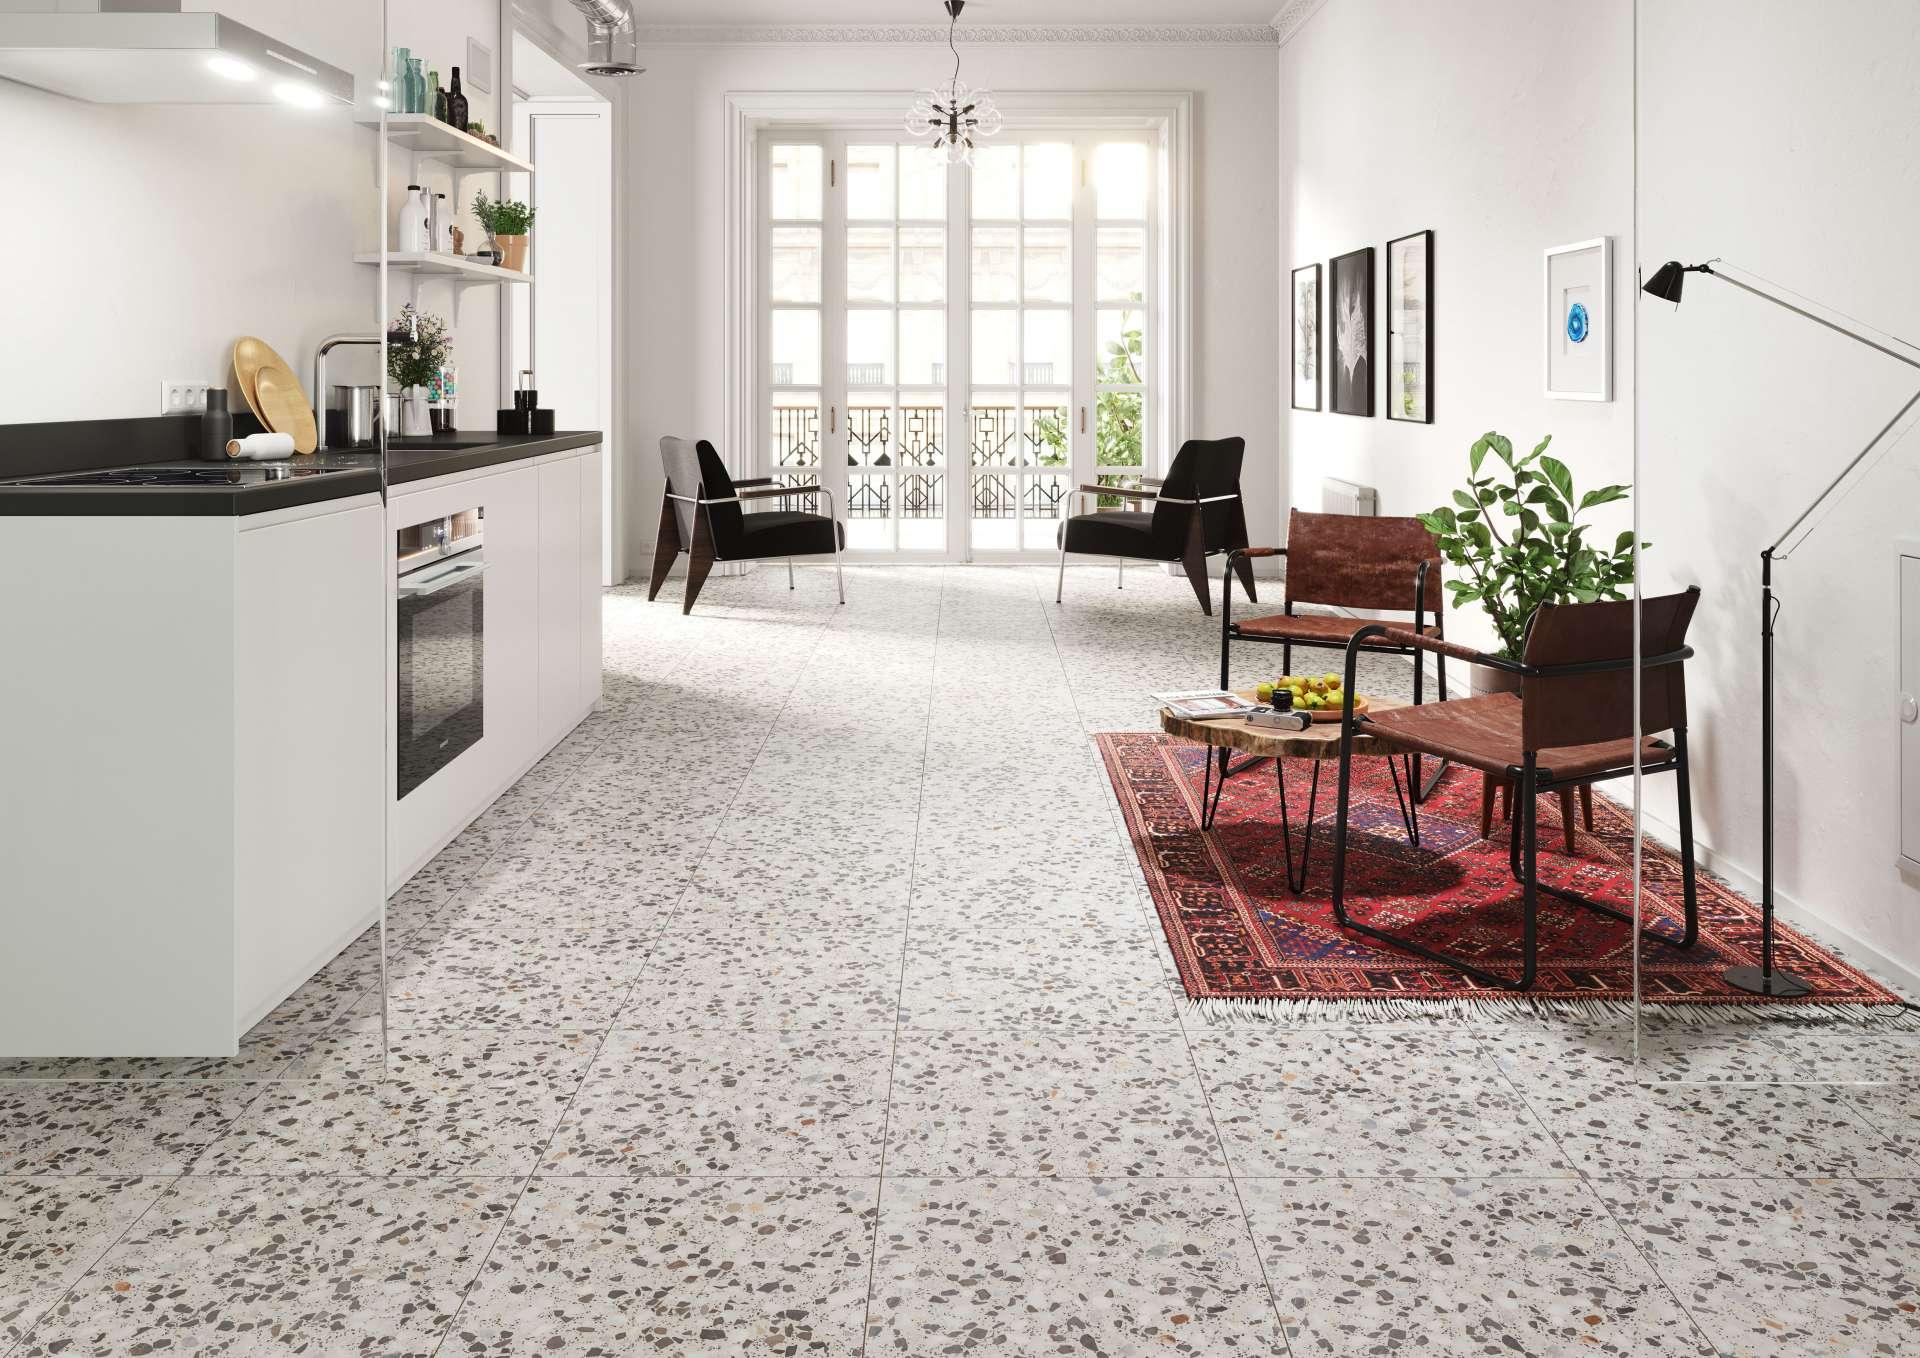 2019 Interior Design Trend Terrazo Flooring.jpg